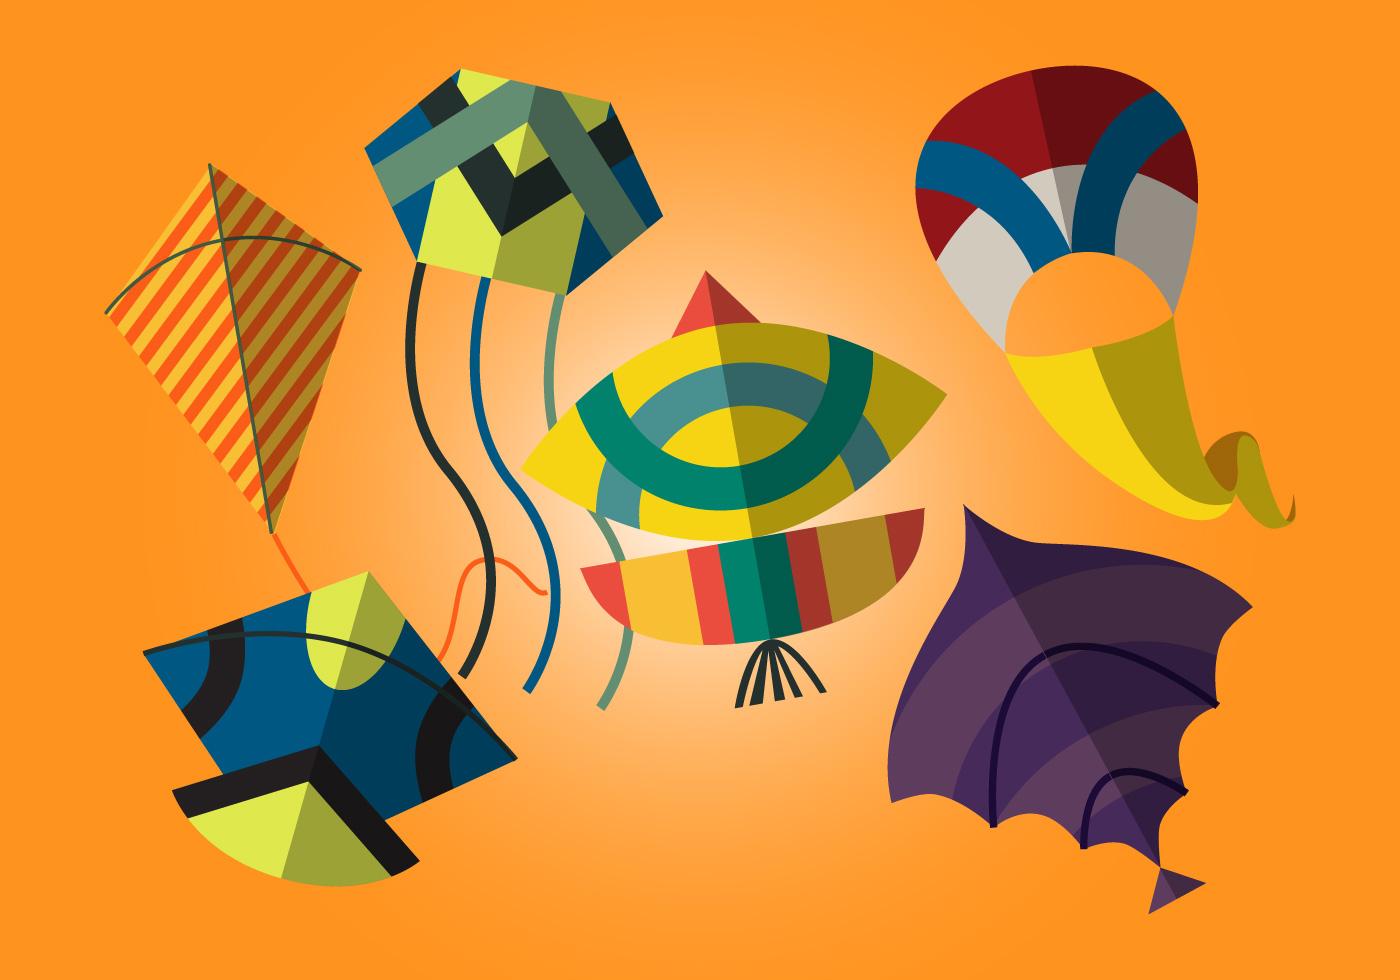 Kite Free Vector Art.